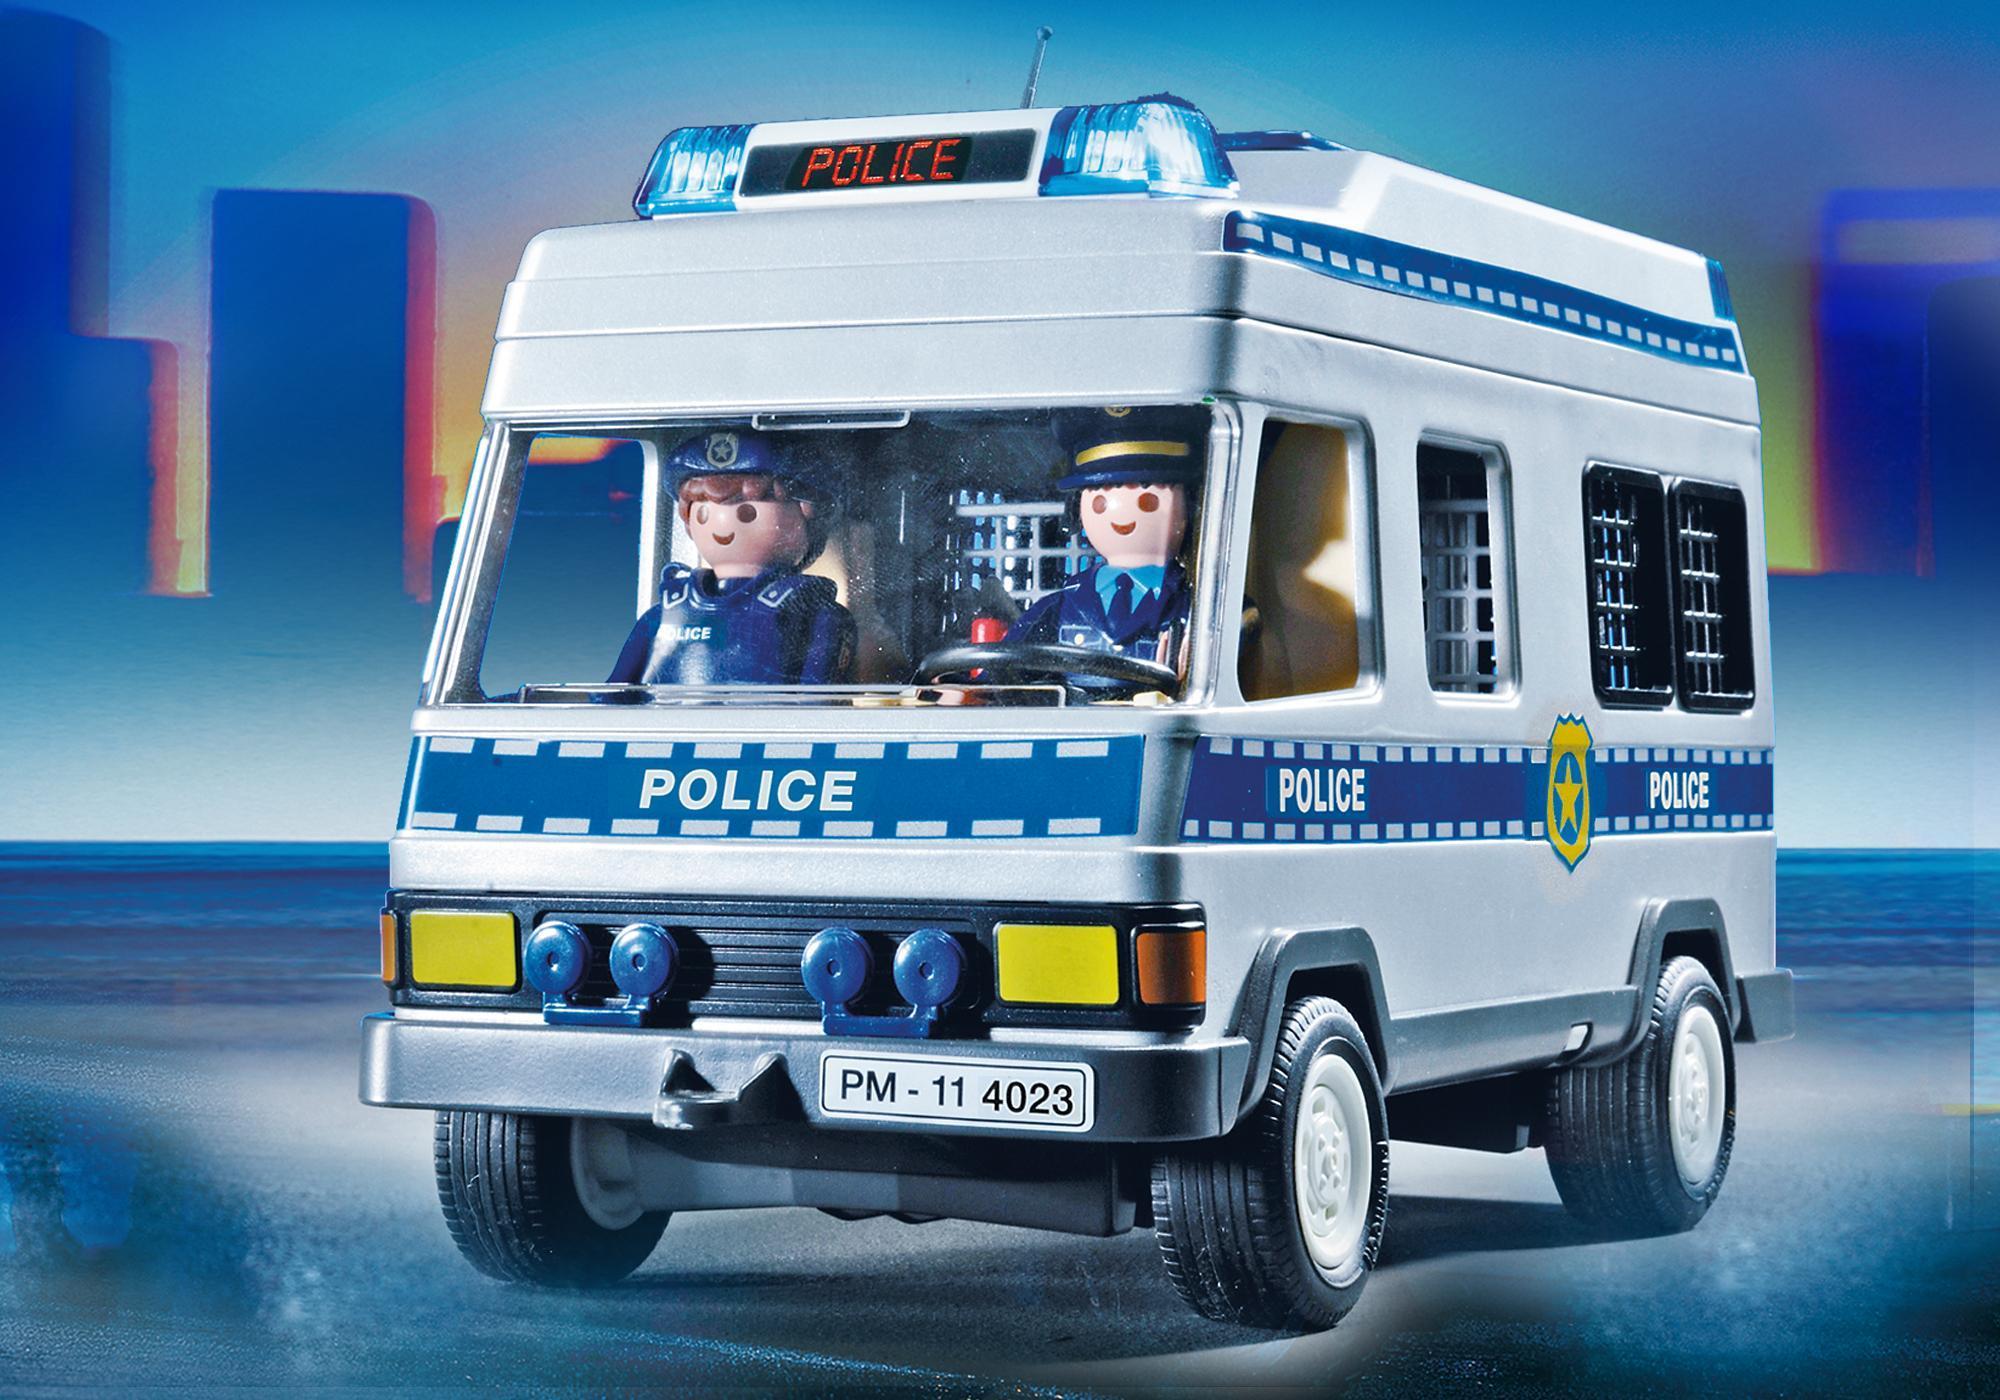 http://media.playmobil.com/i/playmobil/4023_product_extra2/Police Van